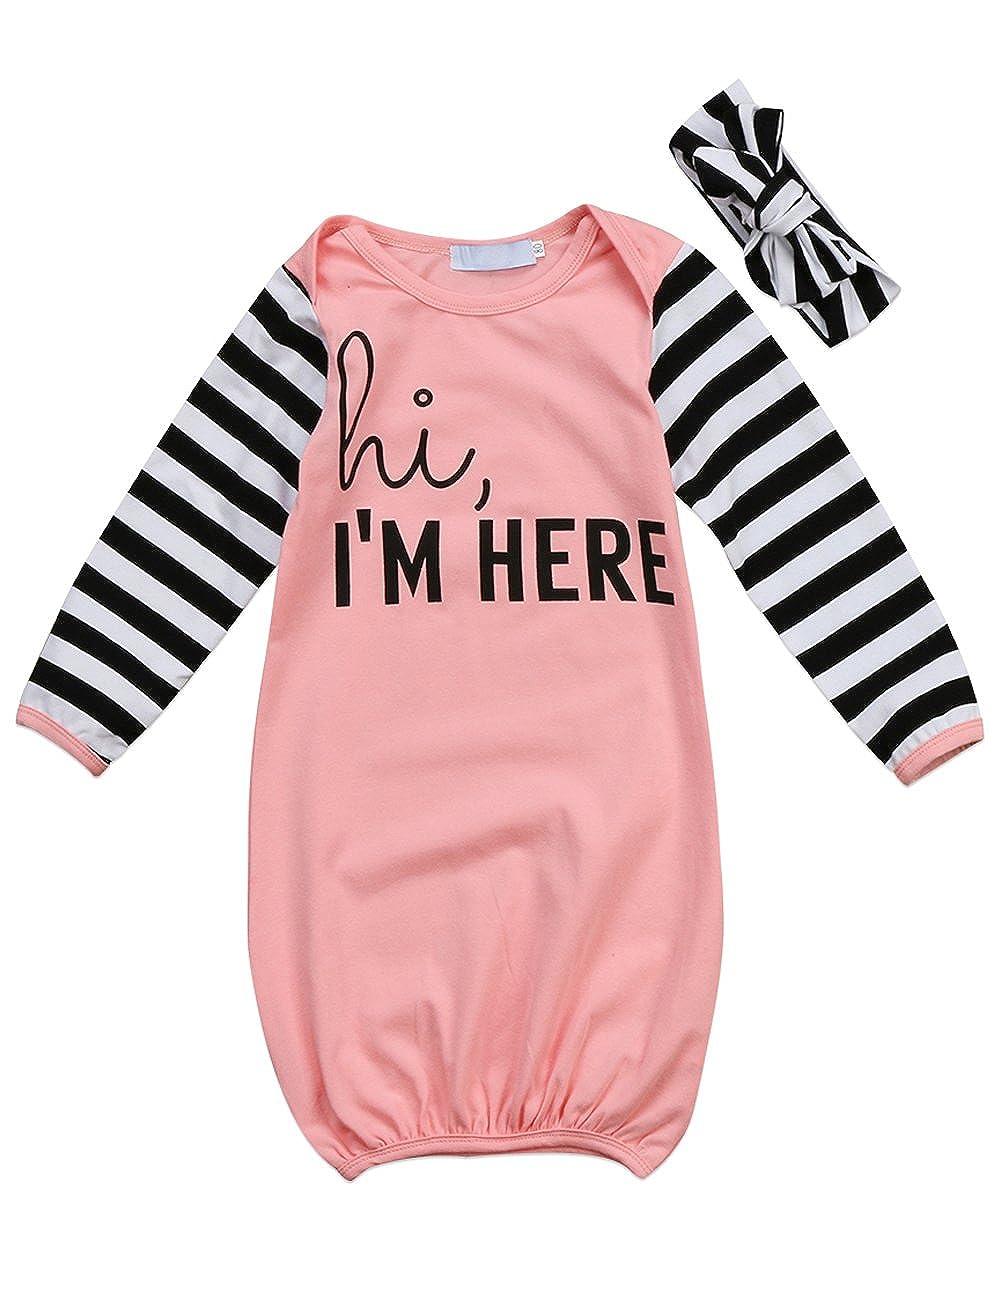 Canis Newborn Baby Boys Girls Long Sleeve Letters Print Sleep Bag Gowns Striped Blanket 0-12M Blue) SHUIDAI2